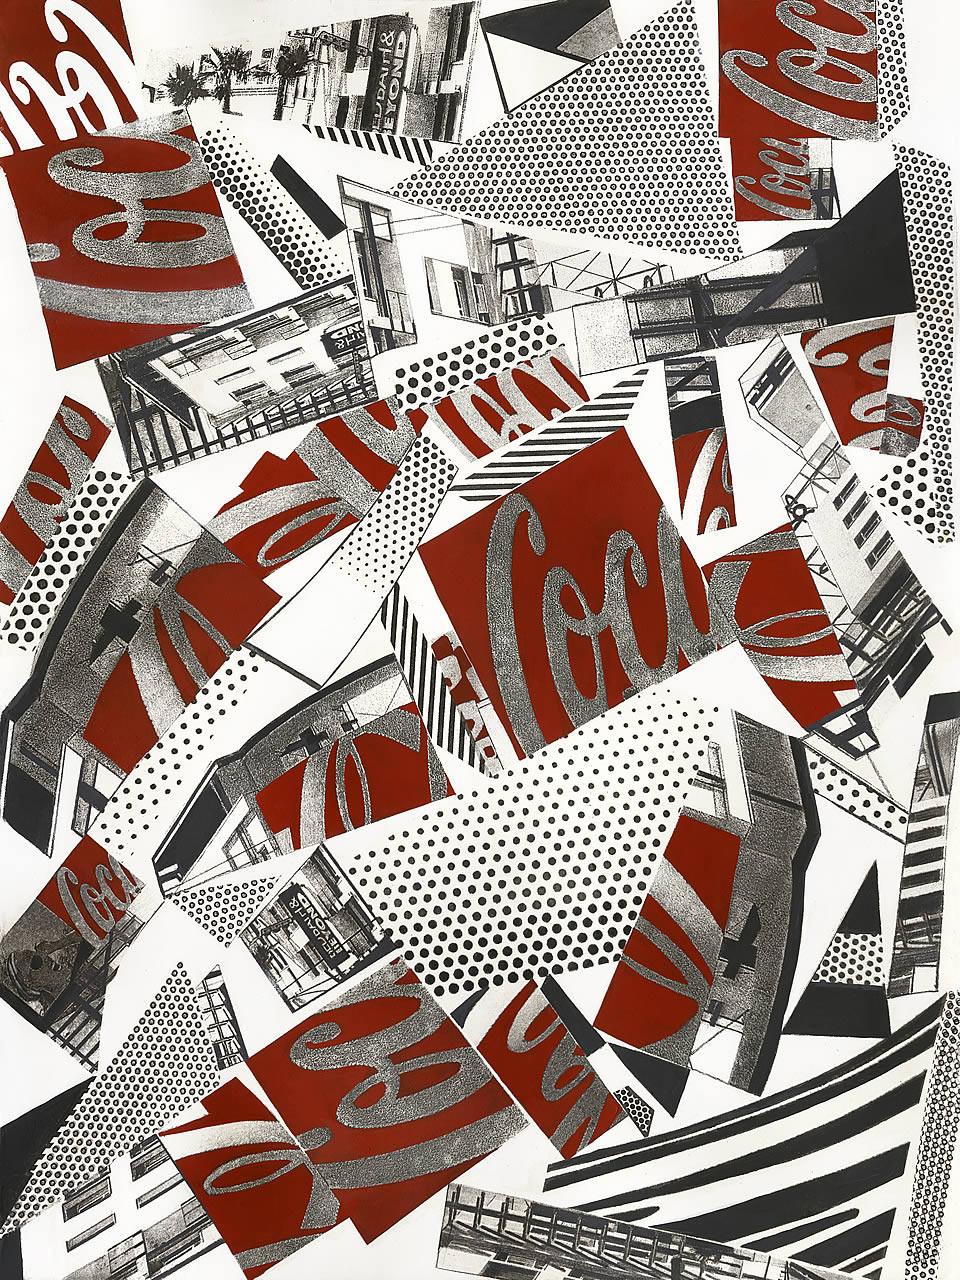 Hollywood Coca Cola, I